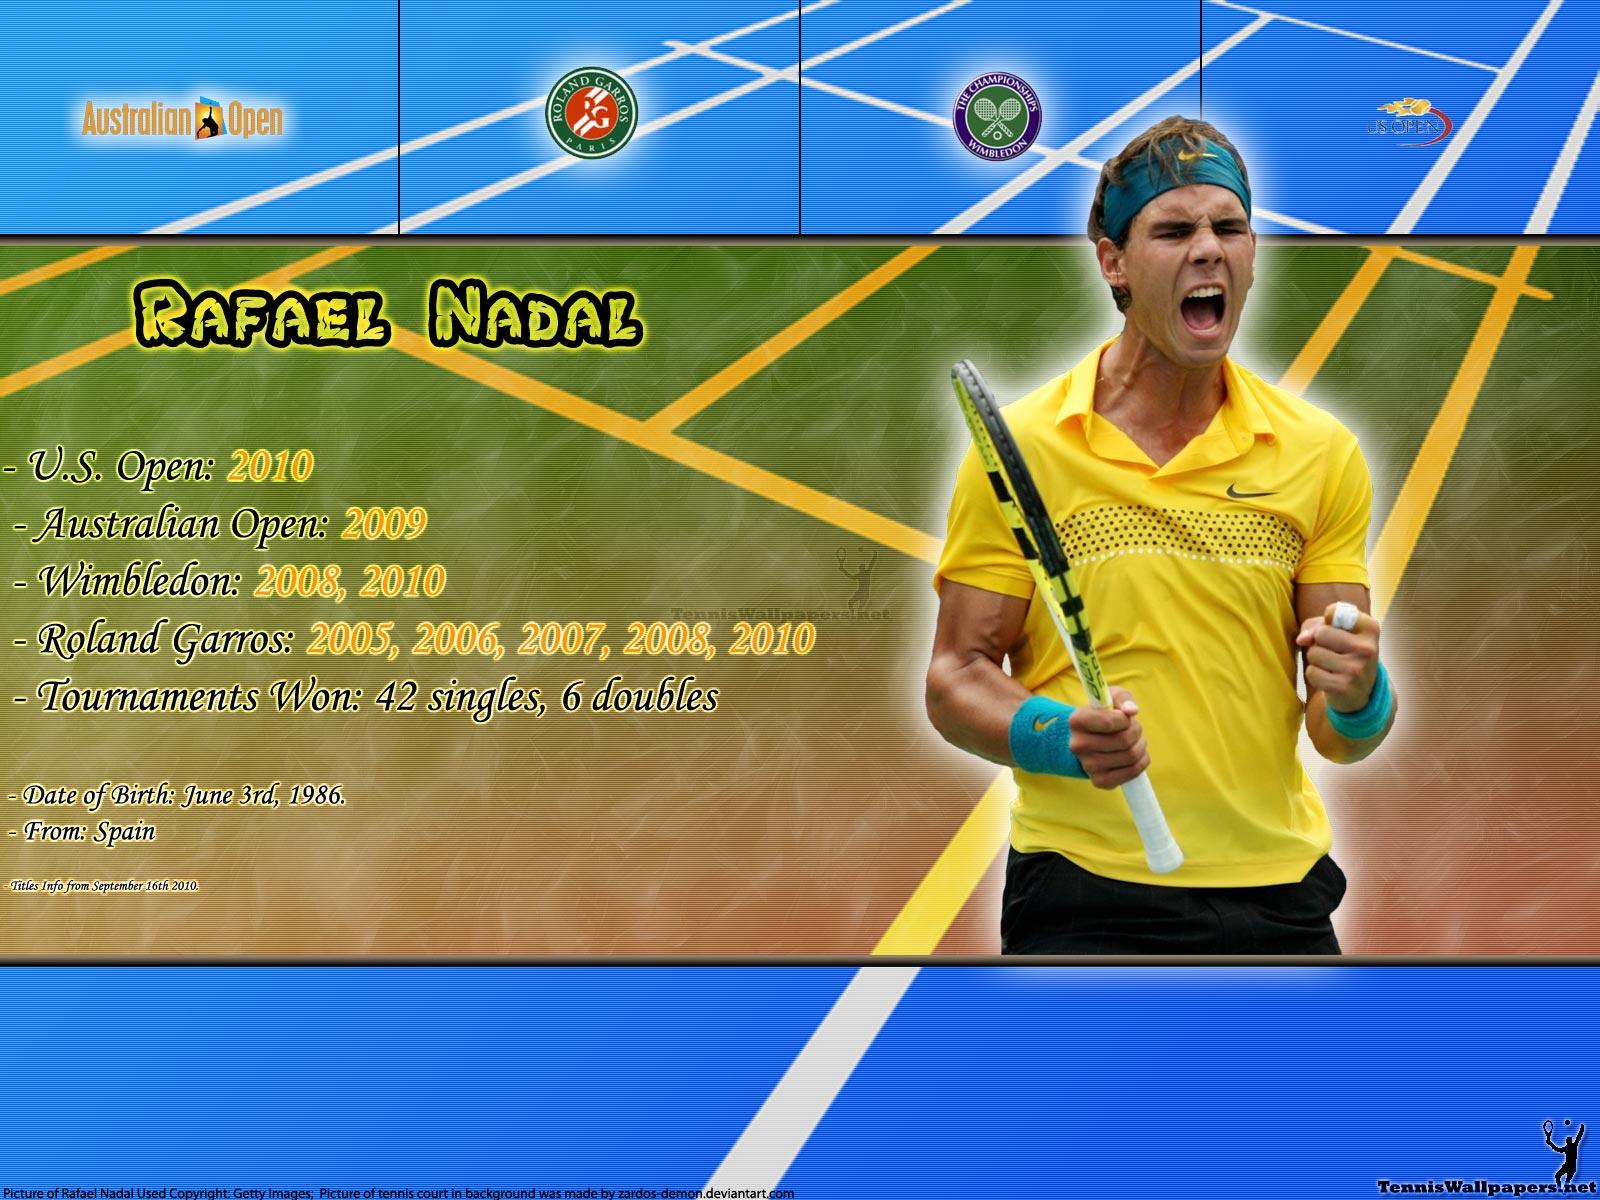 Rafael Nadal Titles Info Photo